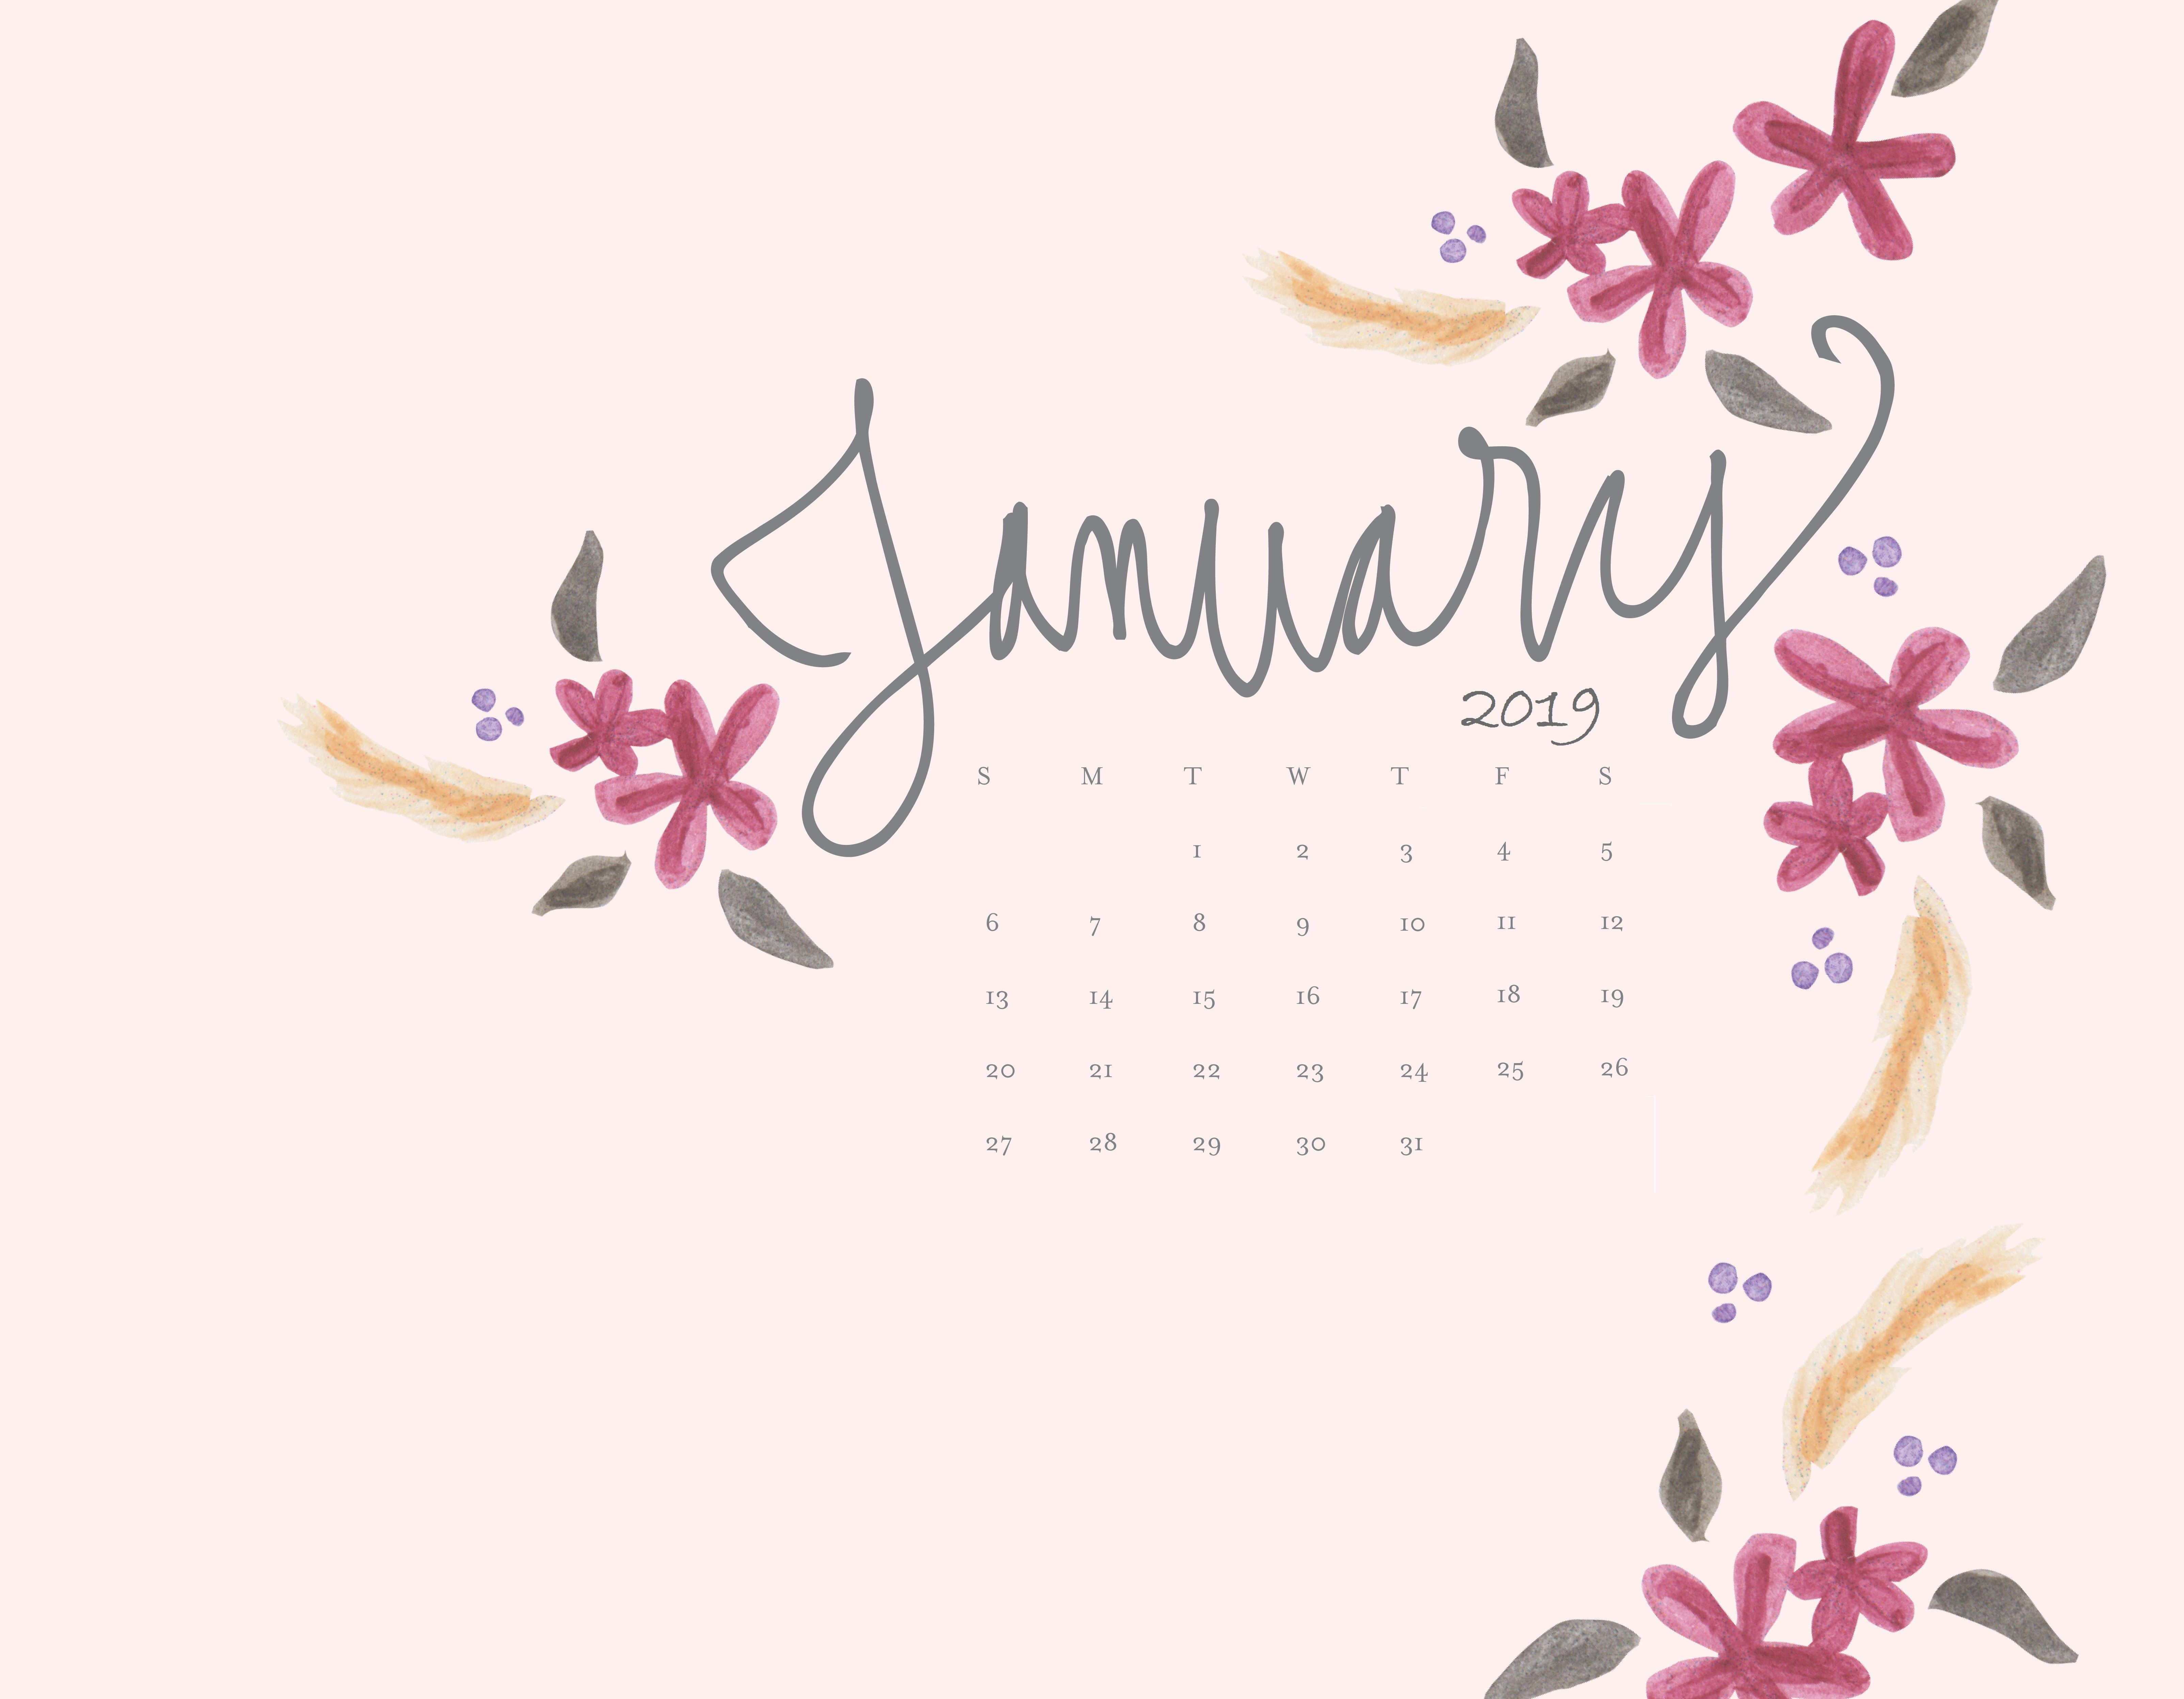 January 2019 Background Calendar January 2019 HD Calendar Wallpapers | MaxCalendars in 2019